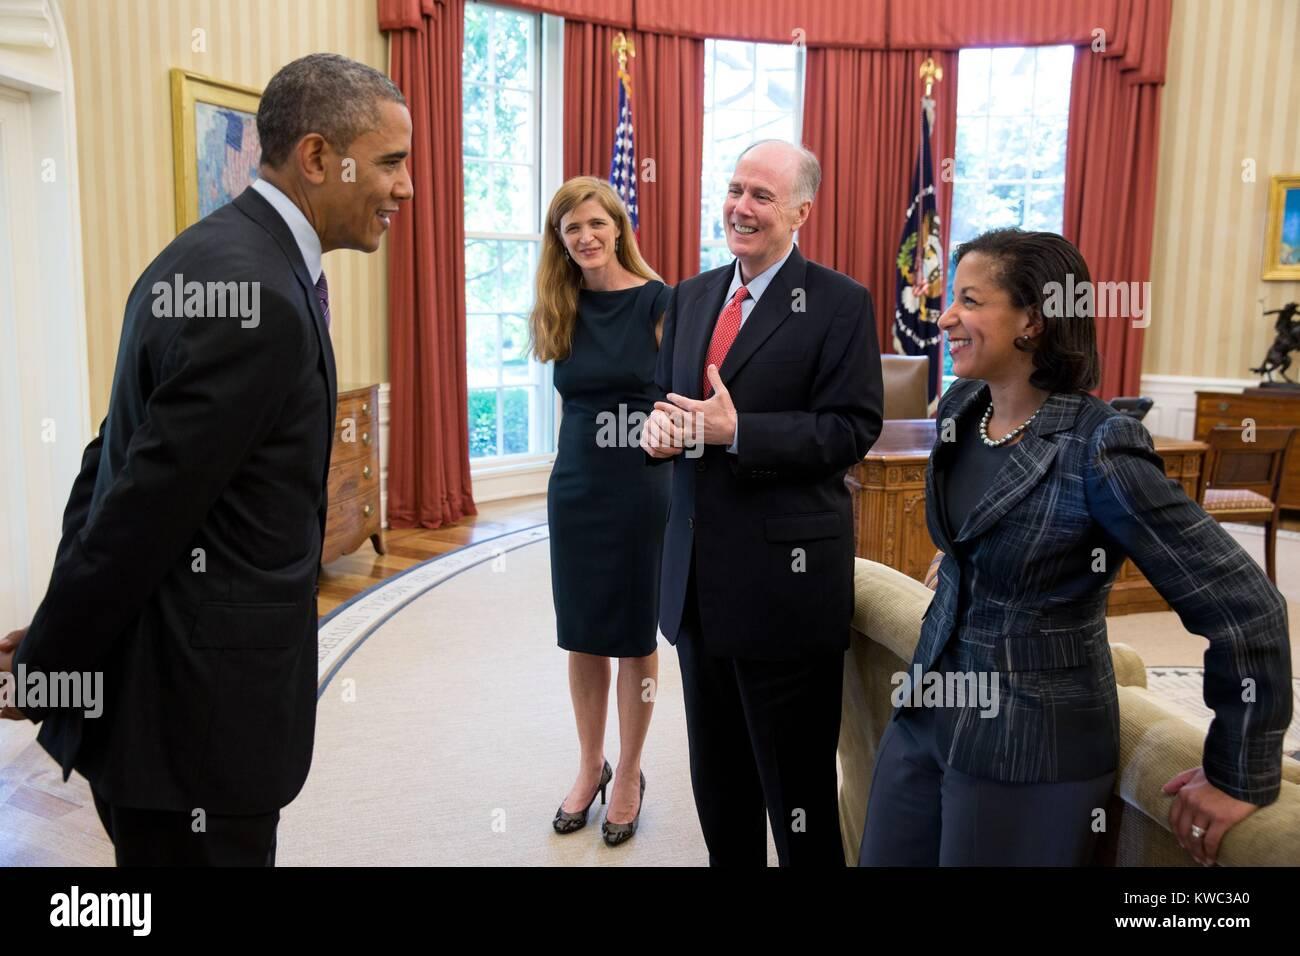 President Barack Obama with advisors in the Oval Office, June 5, 2013. From left: Samantha Power, former Sr. Dir. - Stock Image